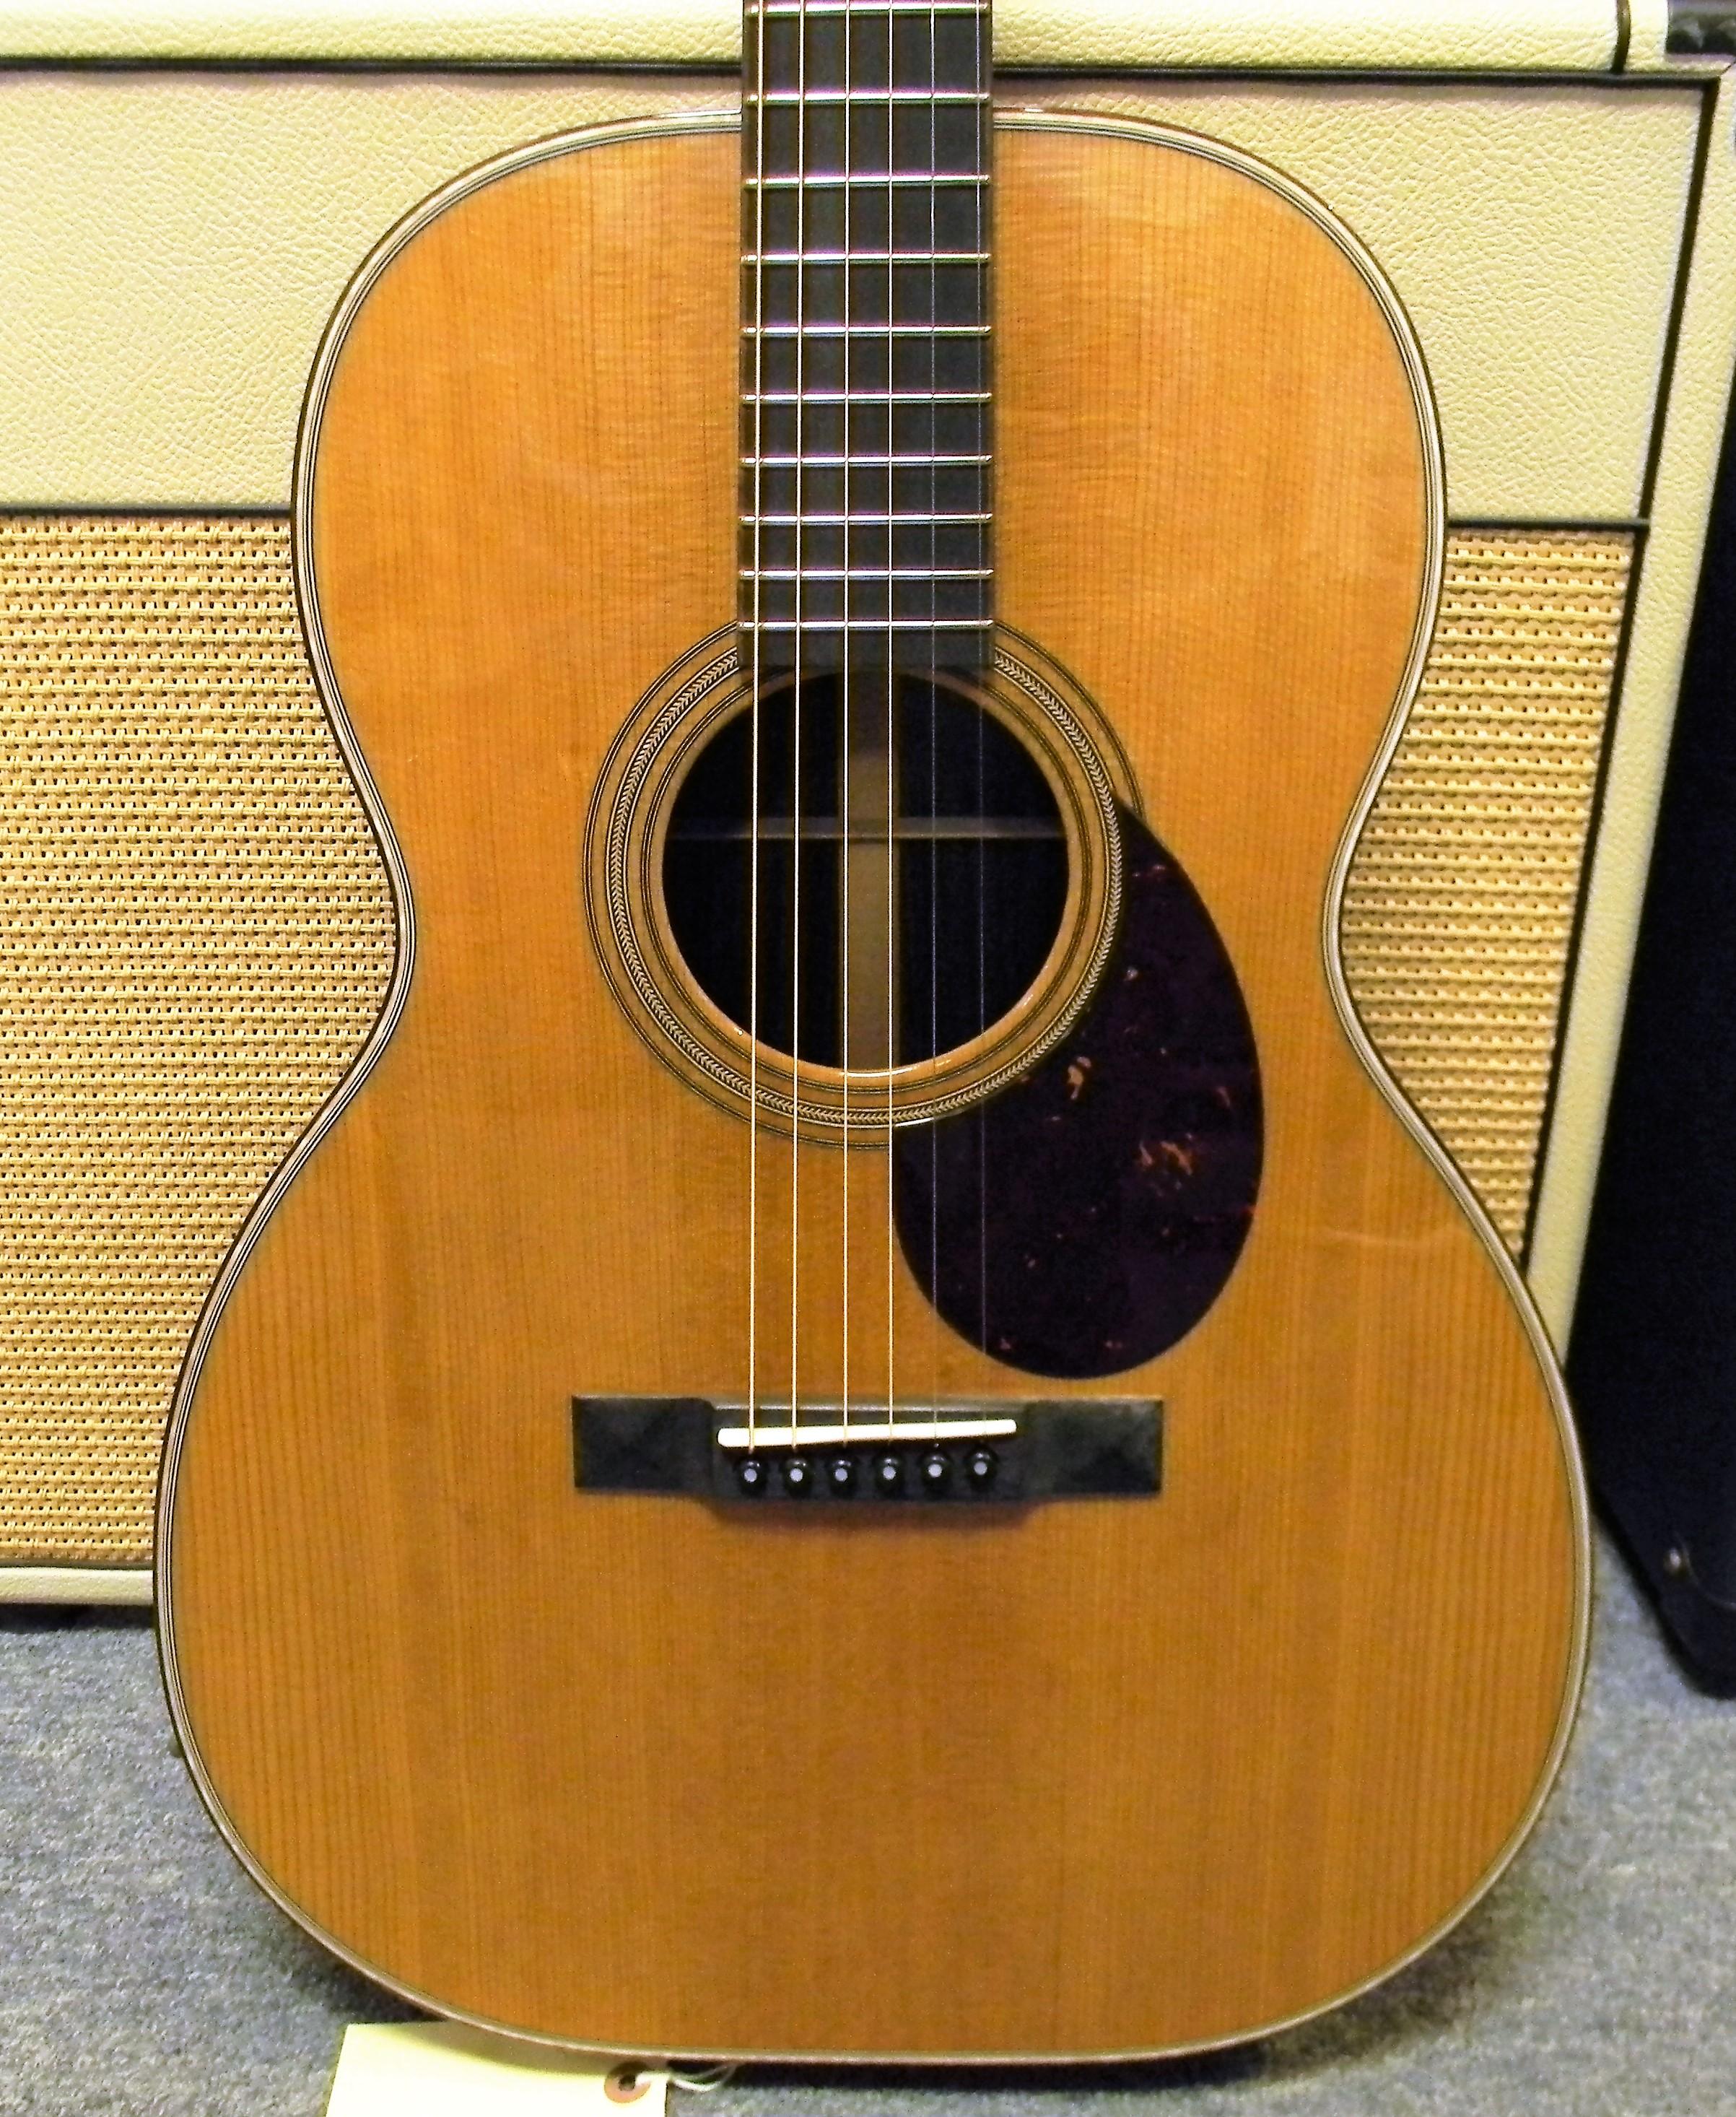 dscn4347 san antonio guitar store guitar tex. Black Bedroom Furniture Sets. Home Design Ideas